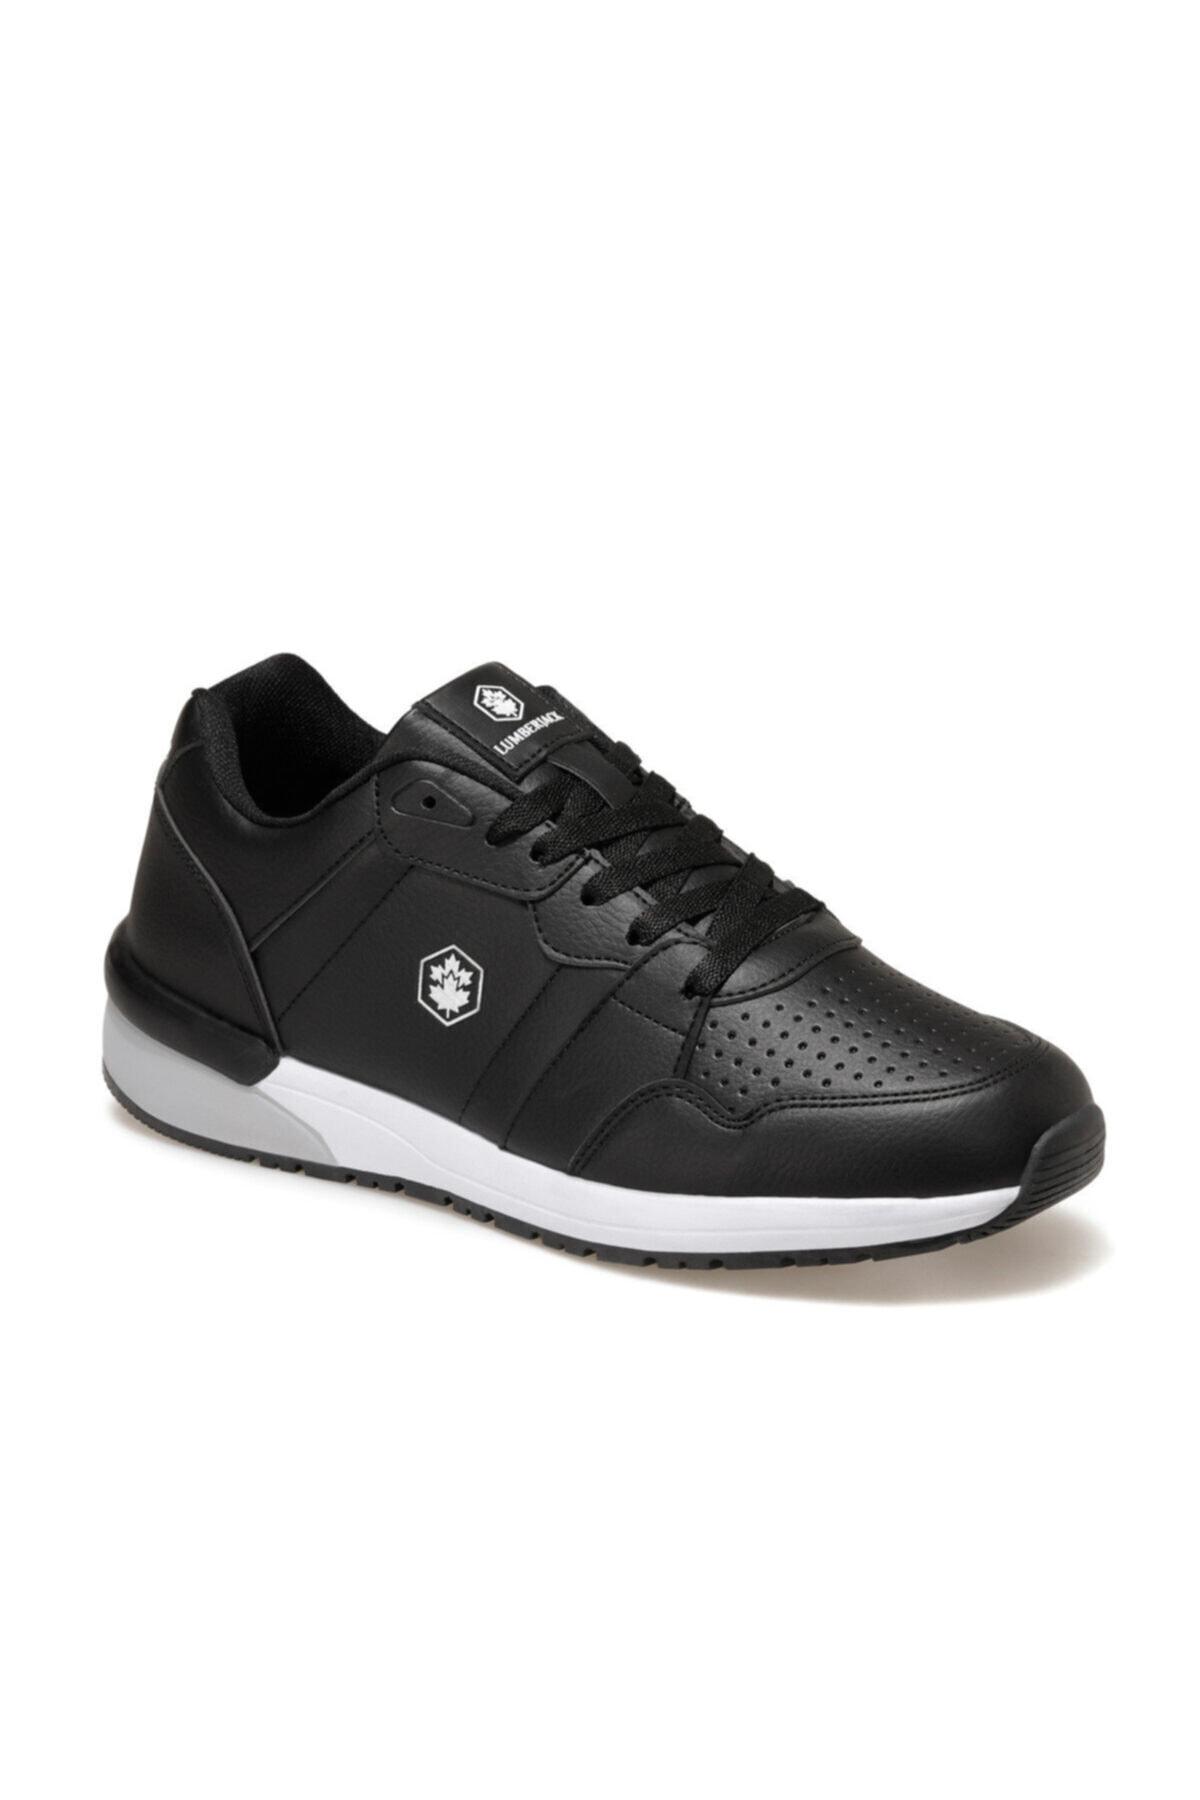 lumberjack MYKONOS Siyah Erkek Sneaker Ayakkabı 100557575 1